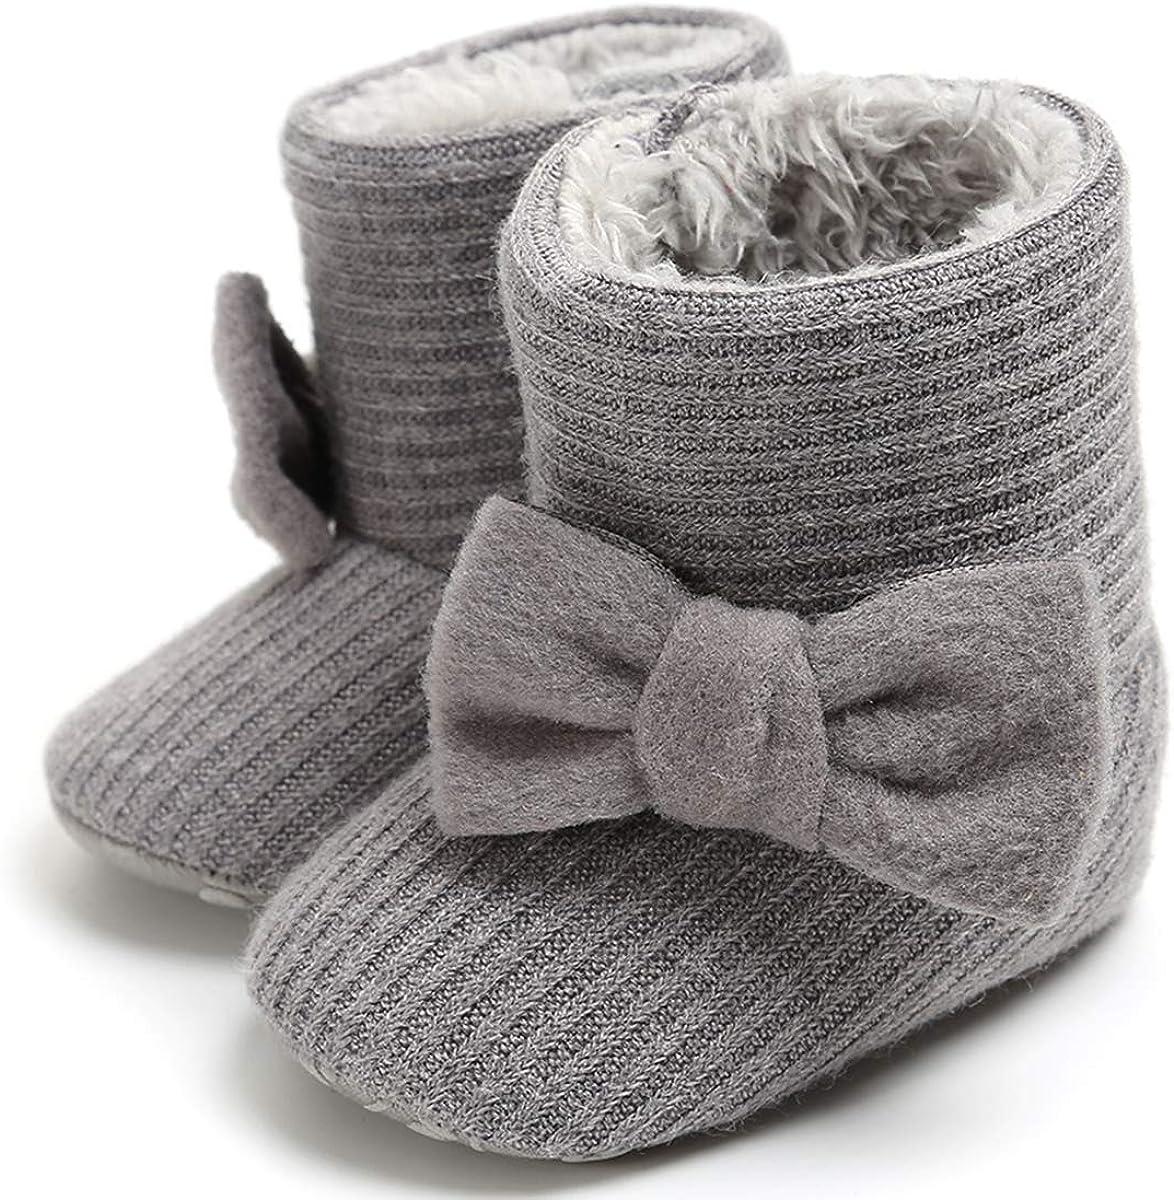 LIVEBOX Prewalker Toddler Boots Premium Soft Anti-Slip Sole Warm Winter Boots for Infant Baby Girls